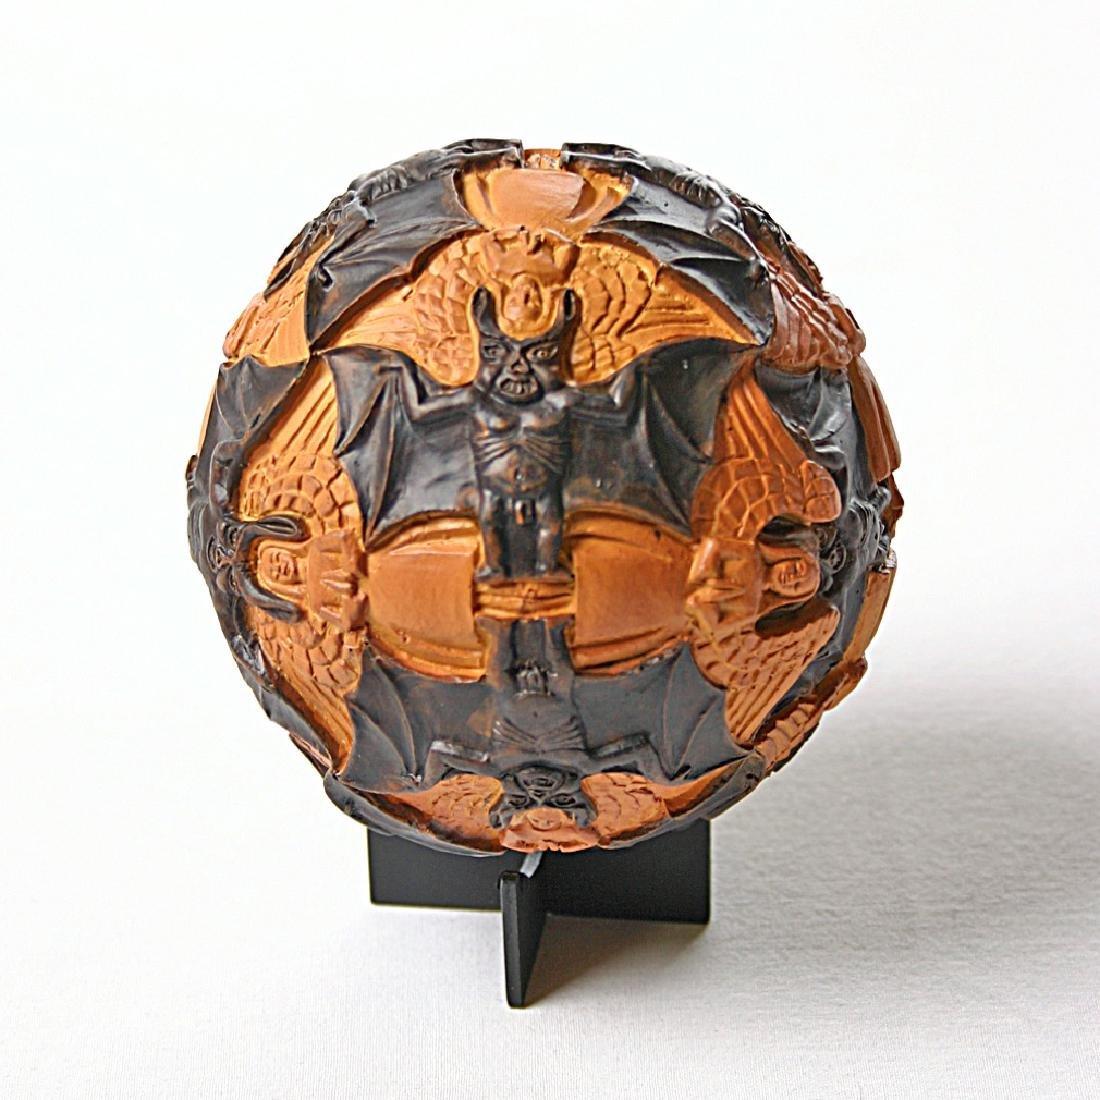 After Maurits Escher: Sphere Angels & Devils Statue - 2